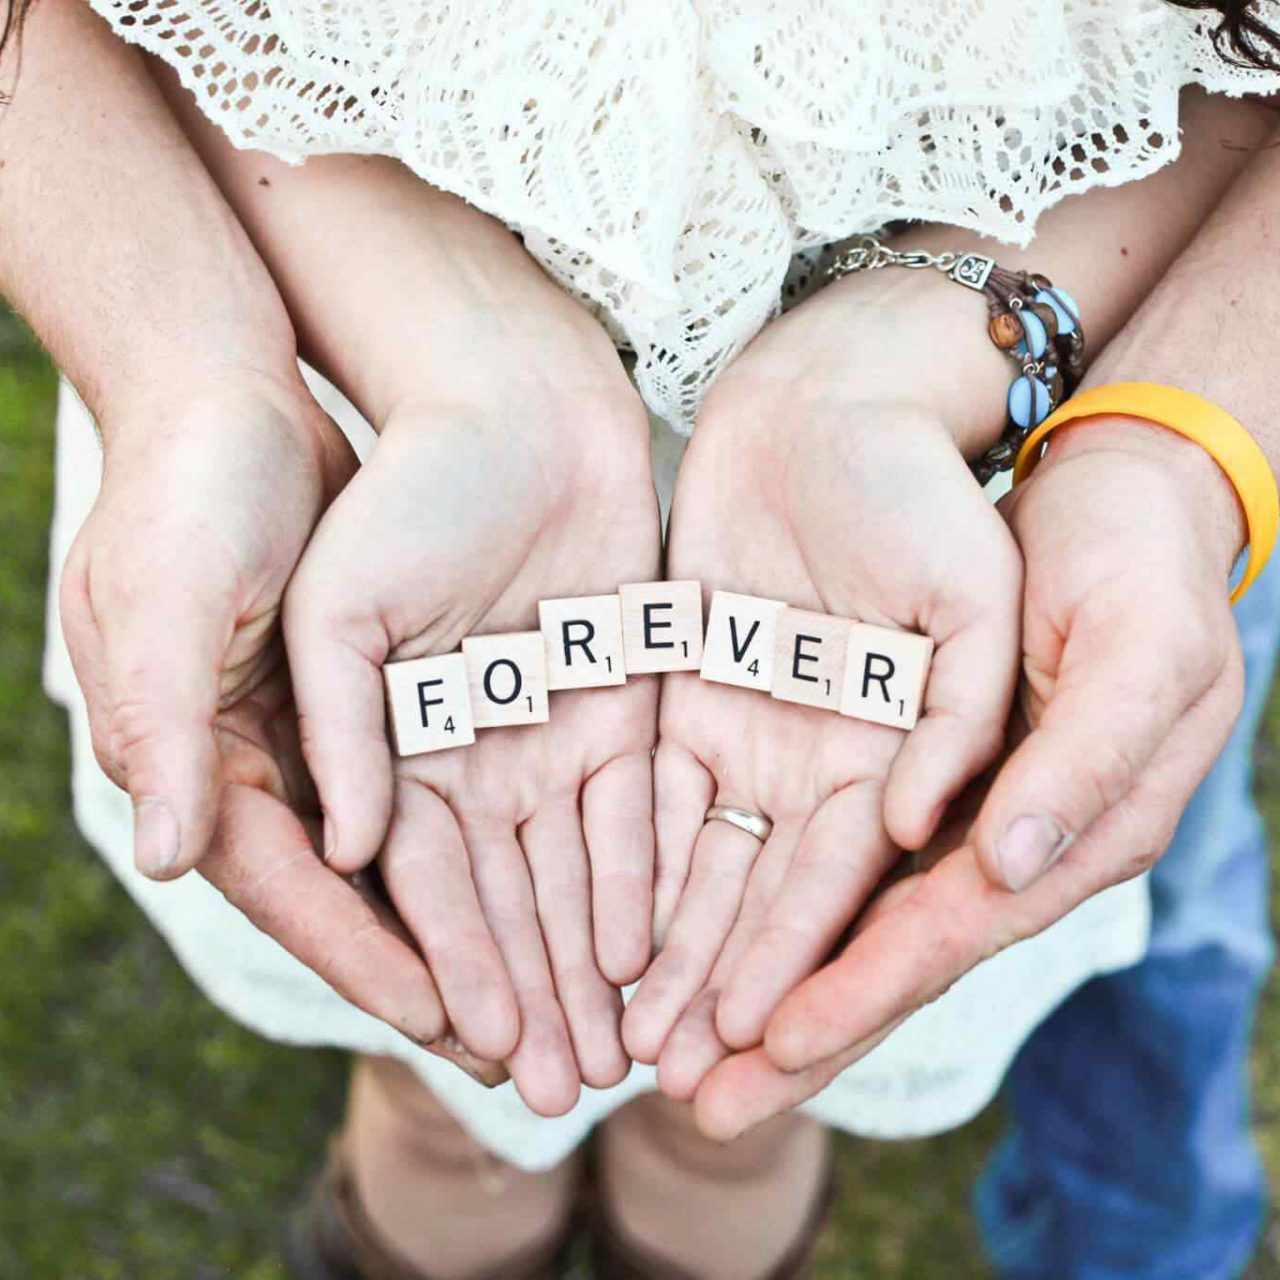 http://gotitasdepoliamor.com/wp-content/uploads/2018/01/img-event-marriage-03-1280x1280.jpg